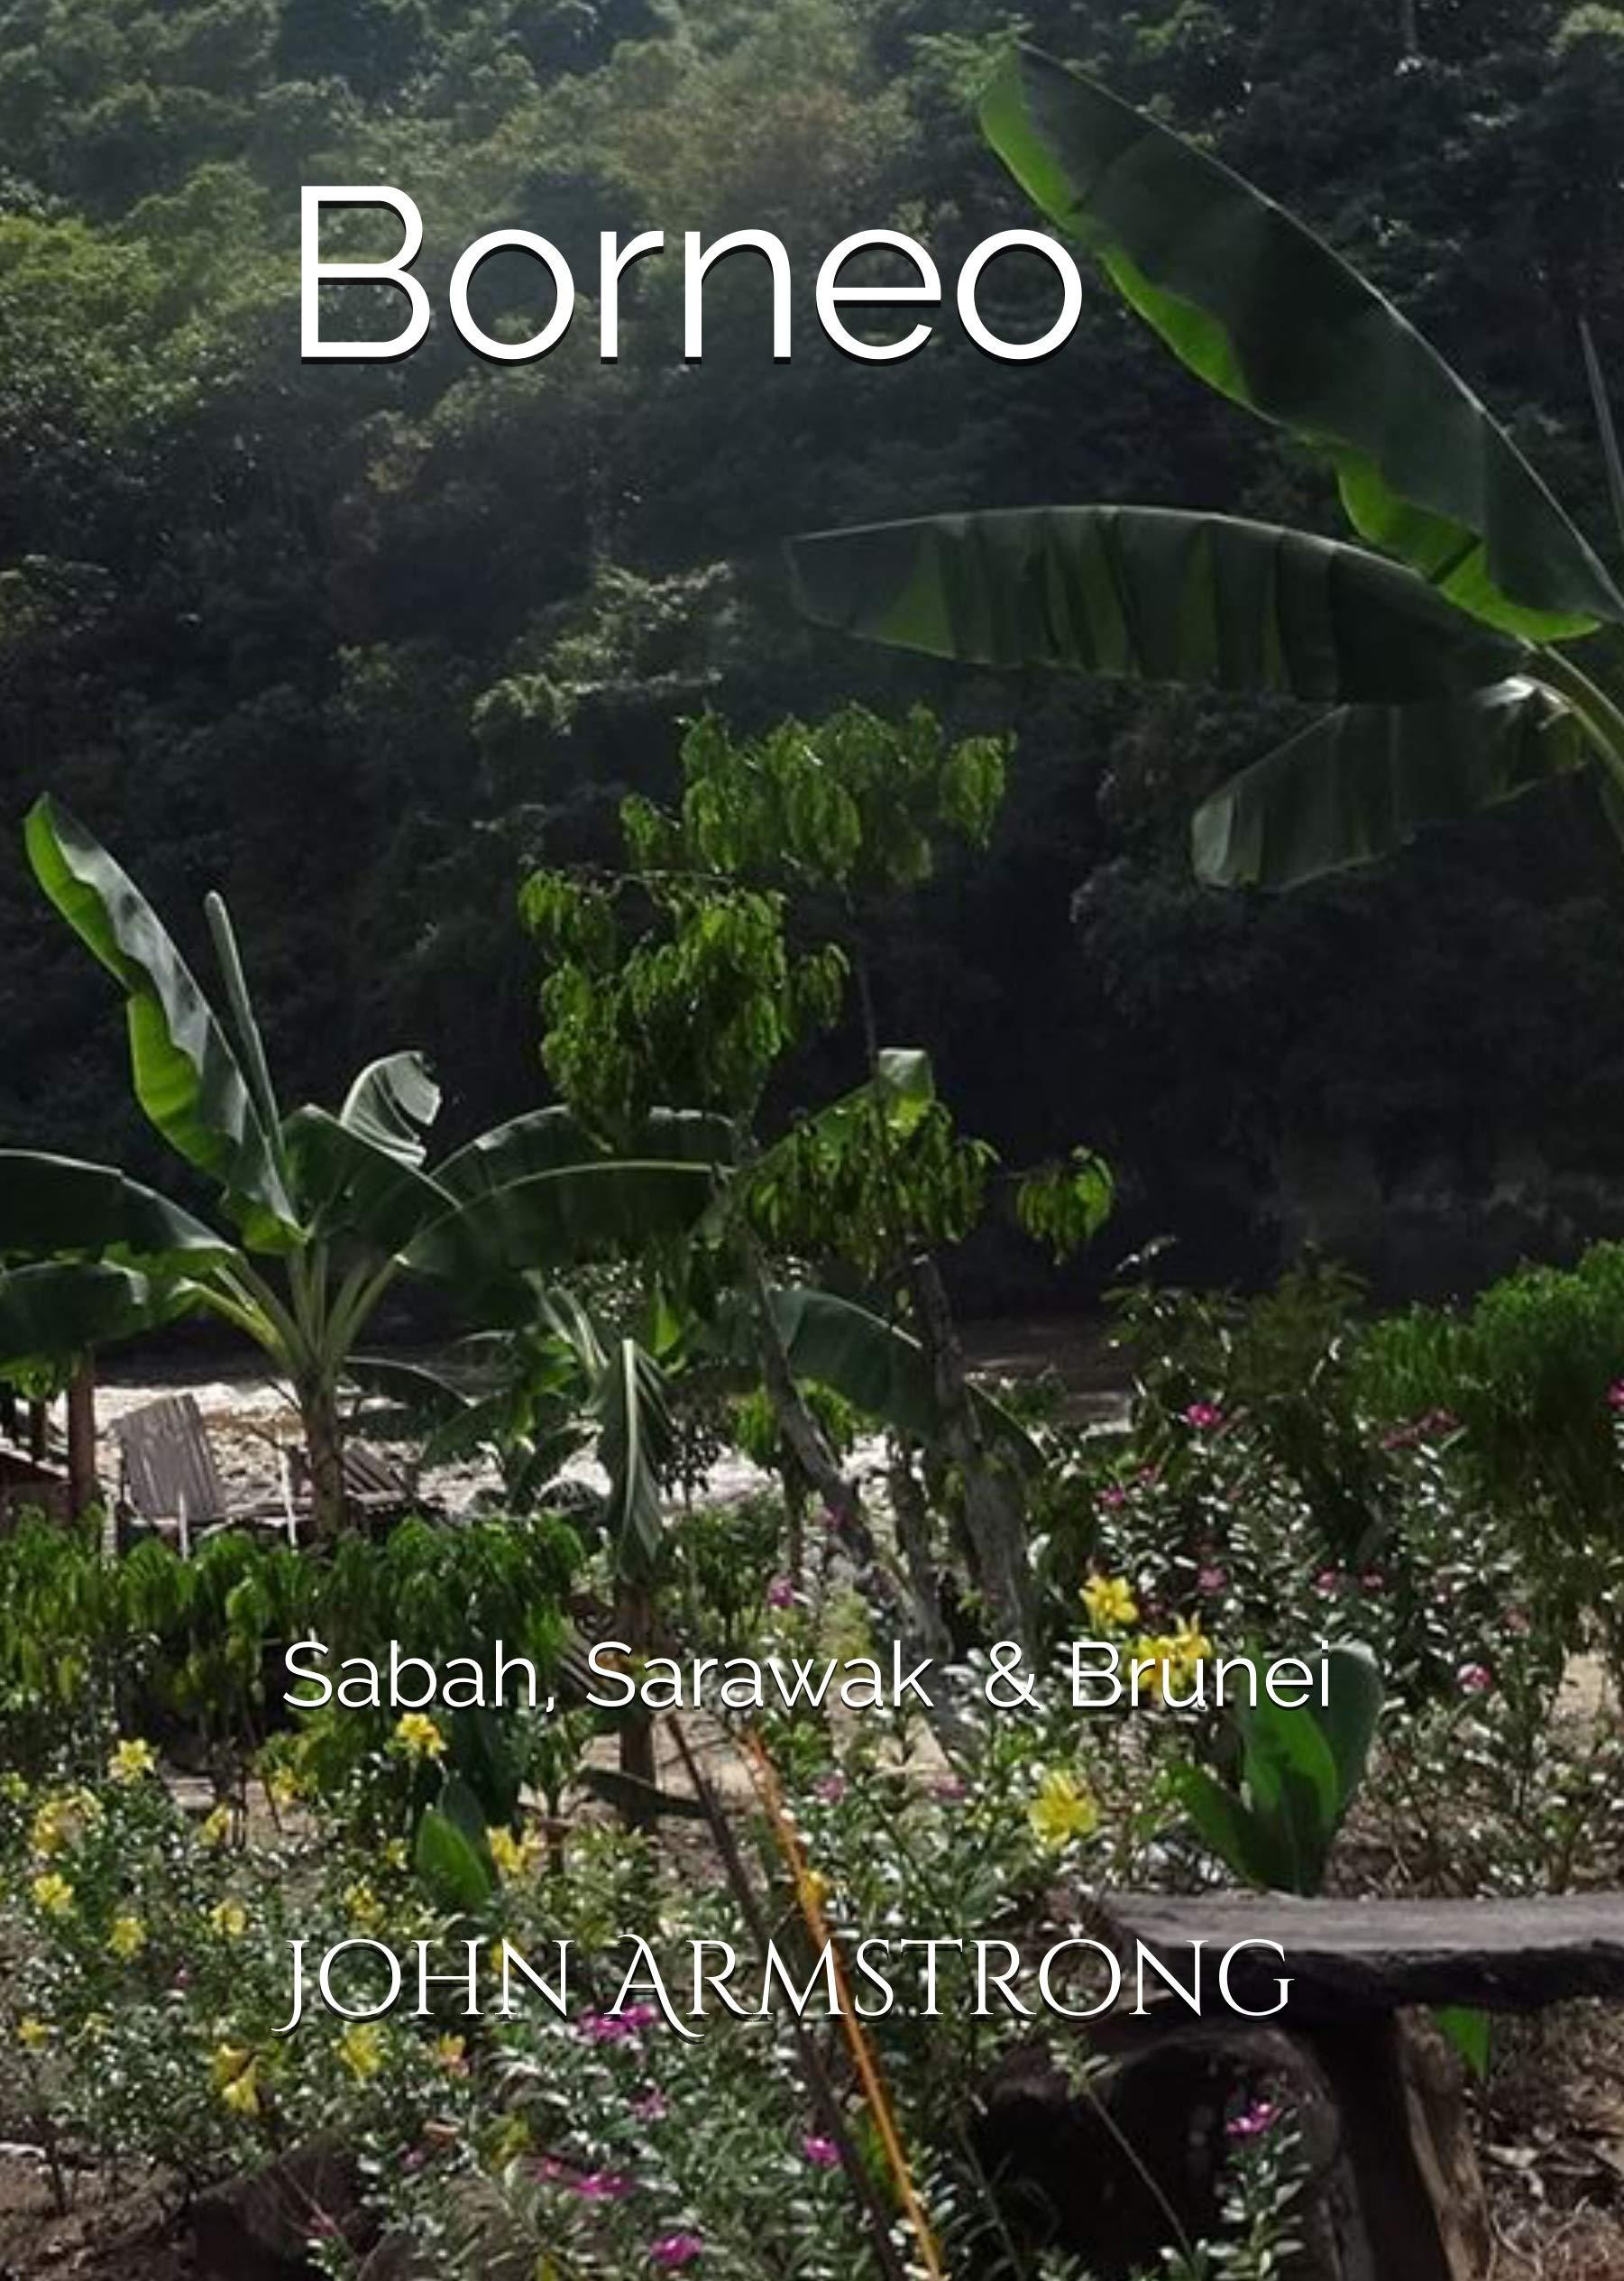 BORNEO  Sabah Brunei And Sarawak  Let Loose Again Book 28   English Edition